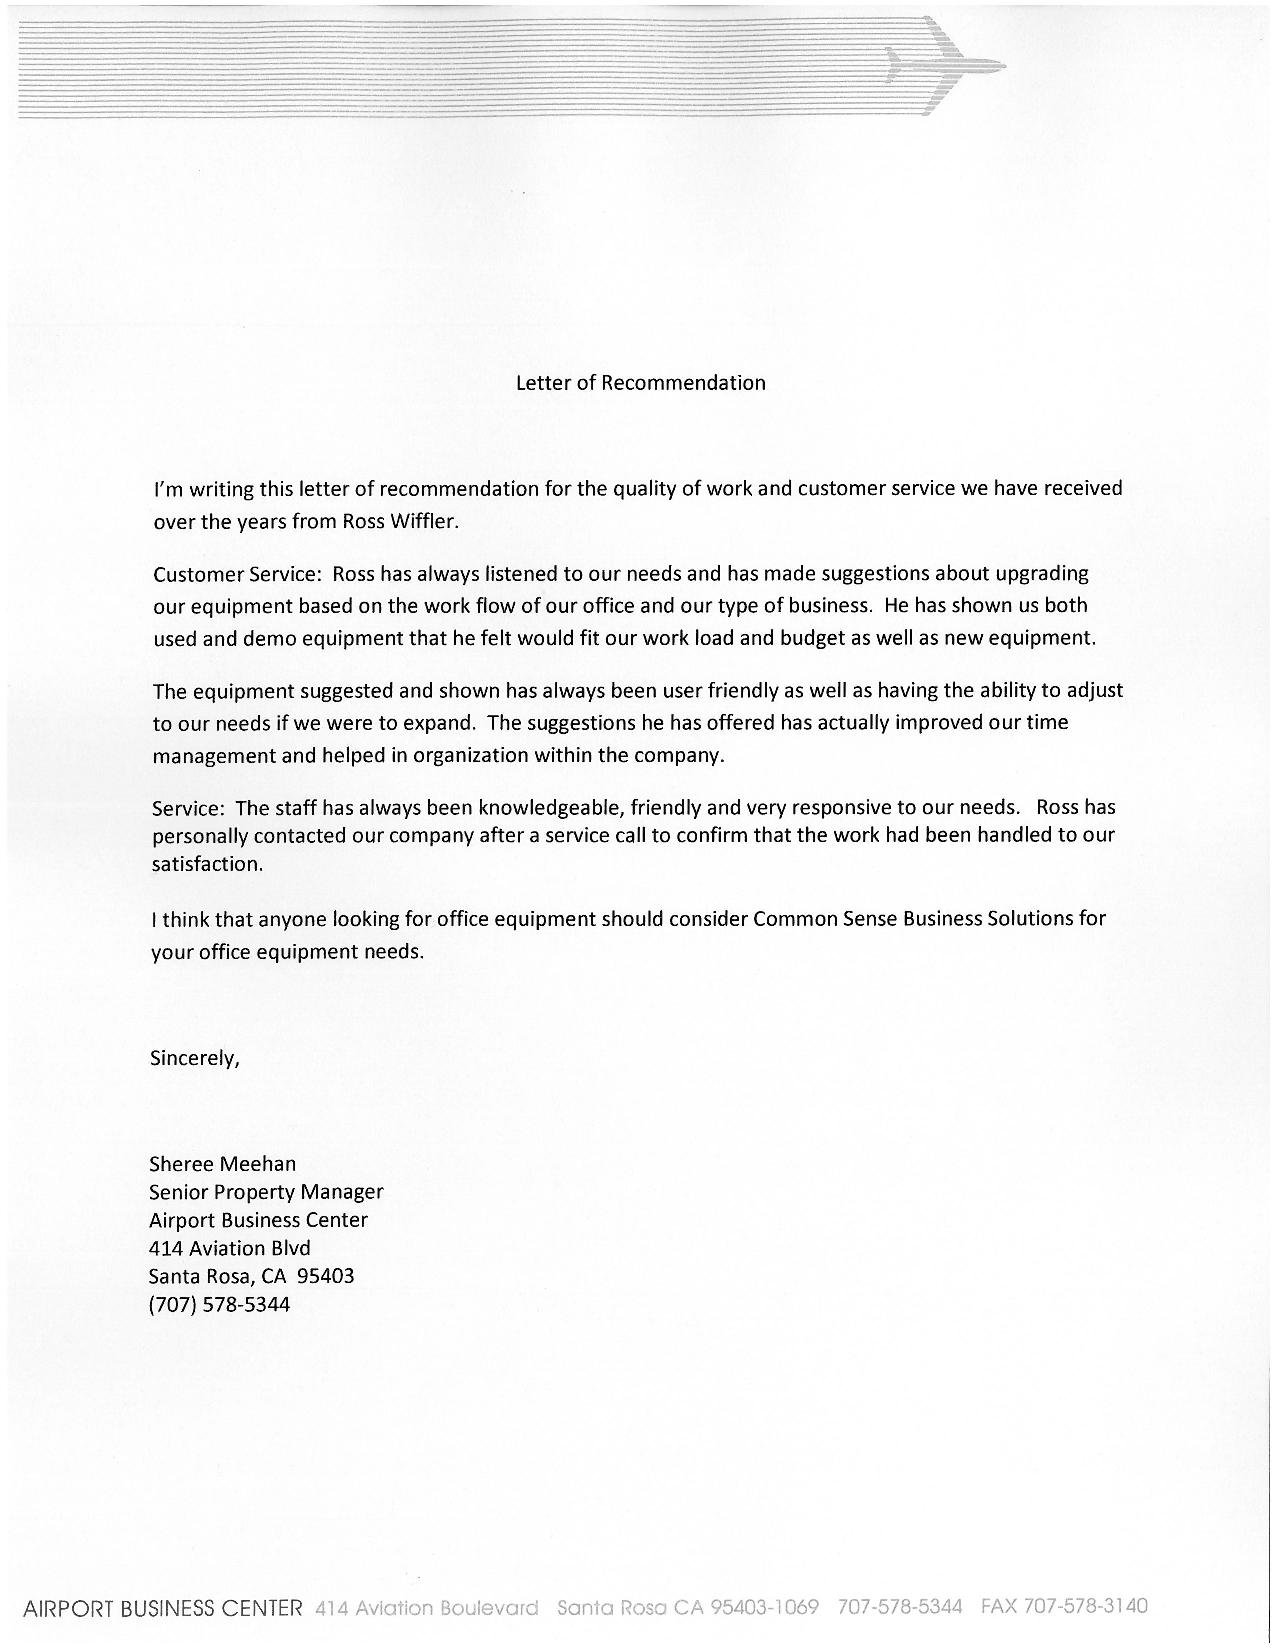 airport business center testimonial letter